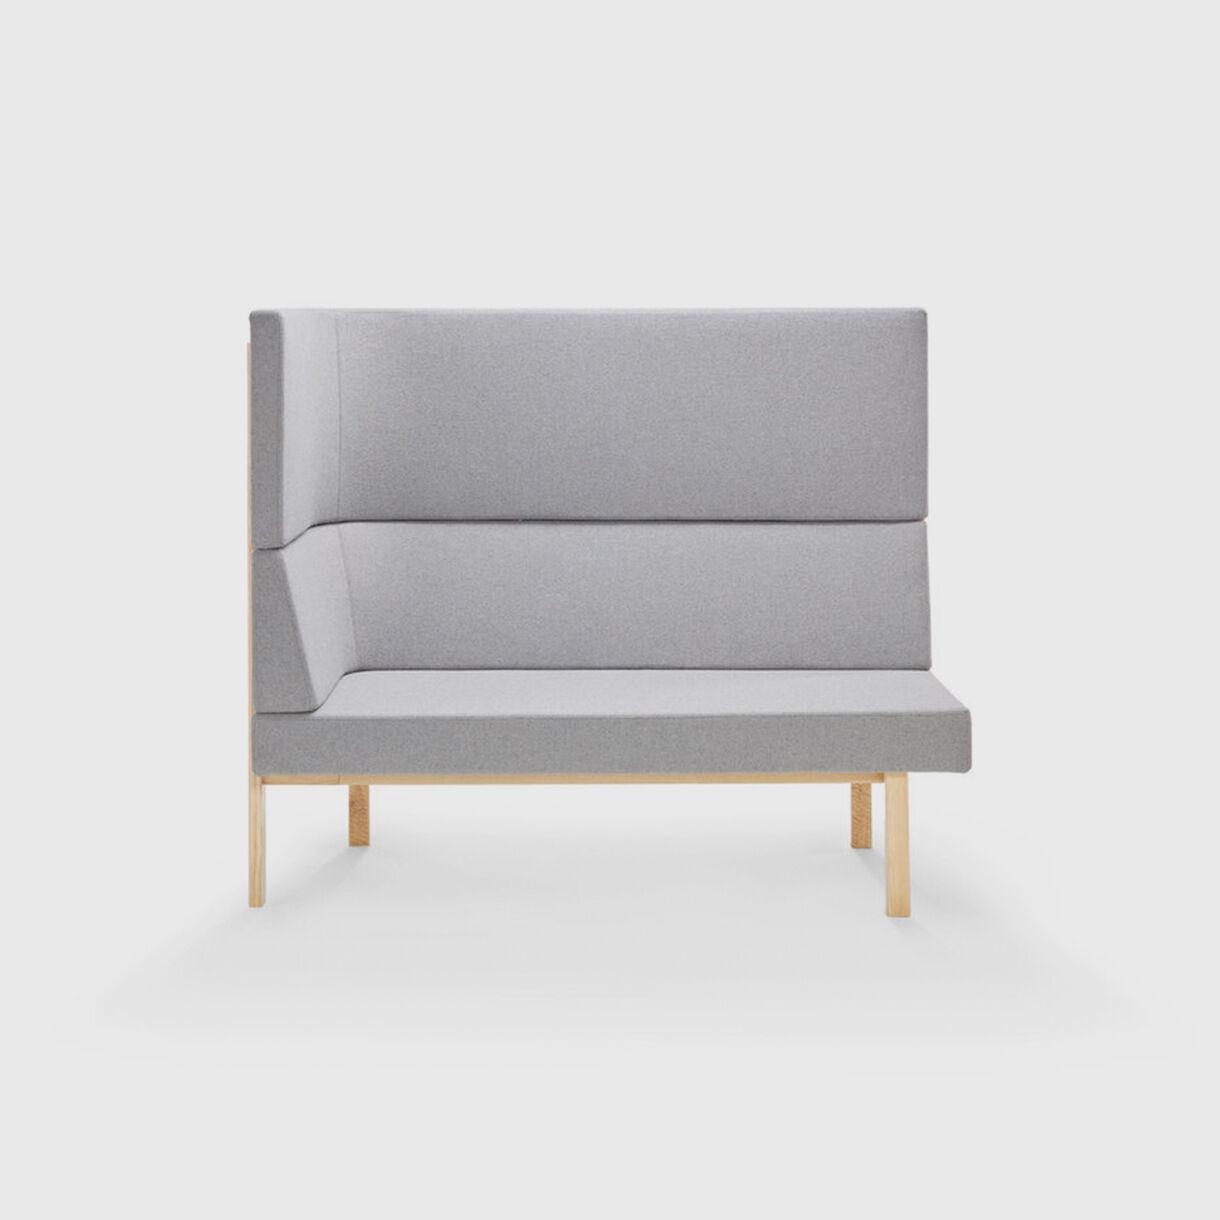 Homework Highback Chaise Lounge, Grey